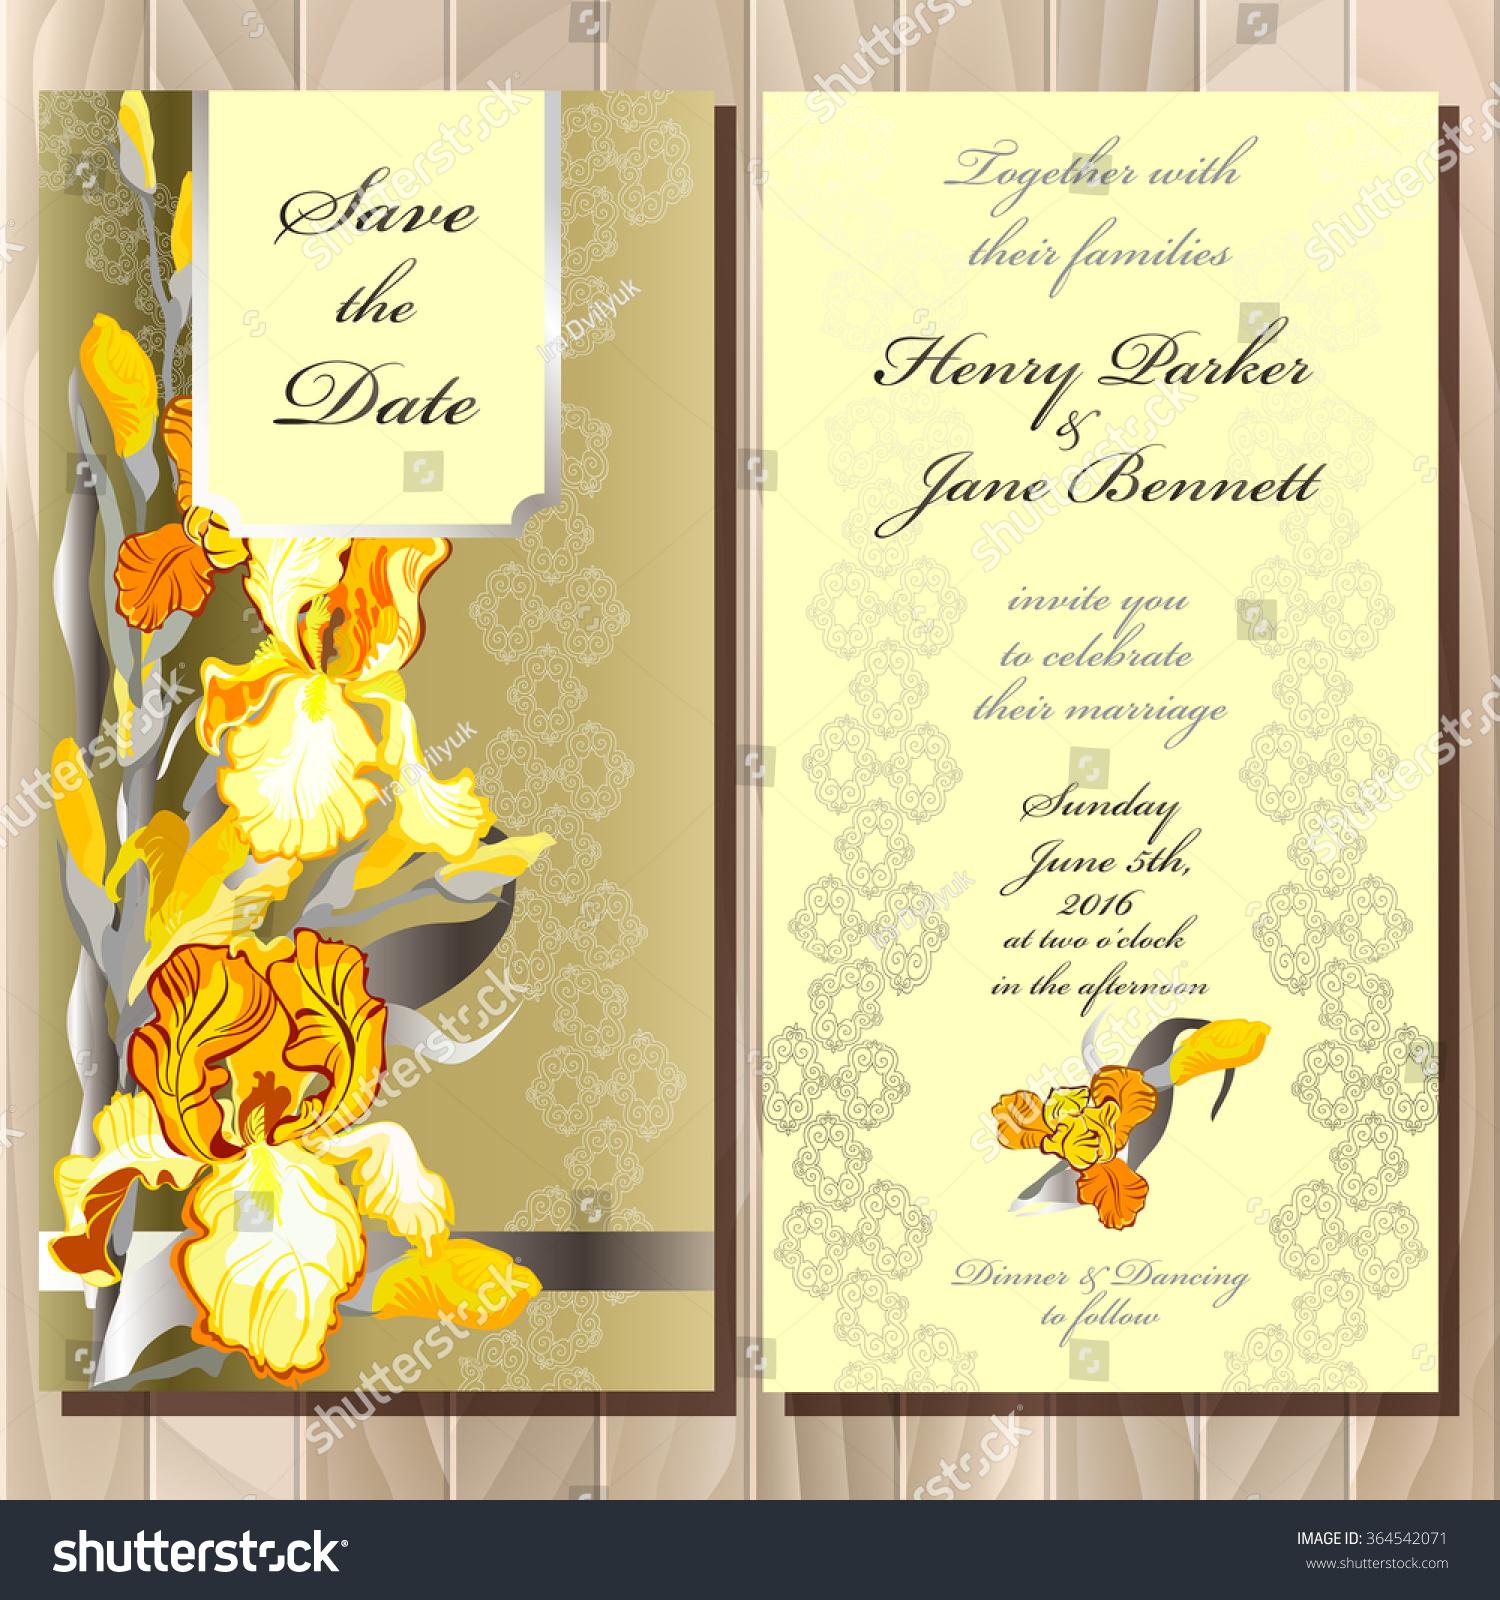 wedding invitation yellow orange golden iris stock vector